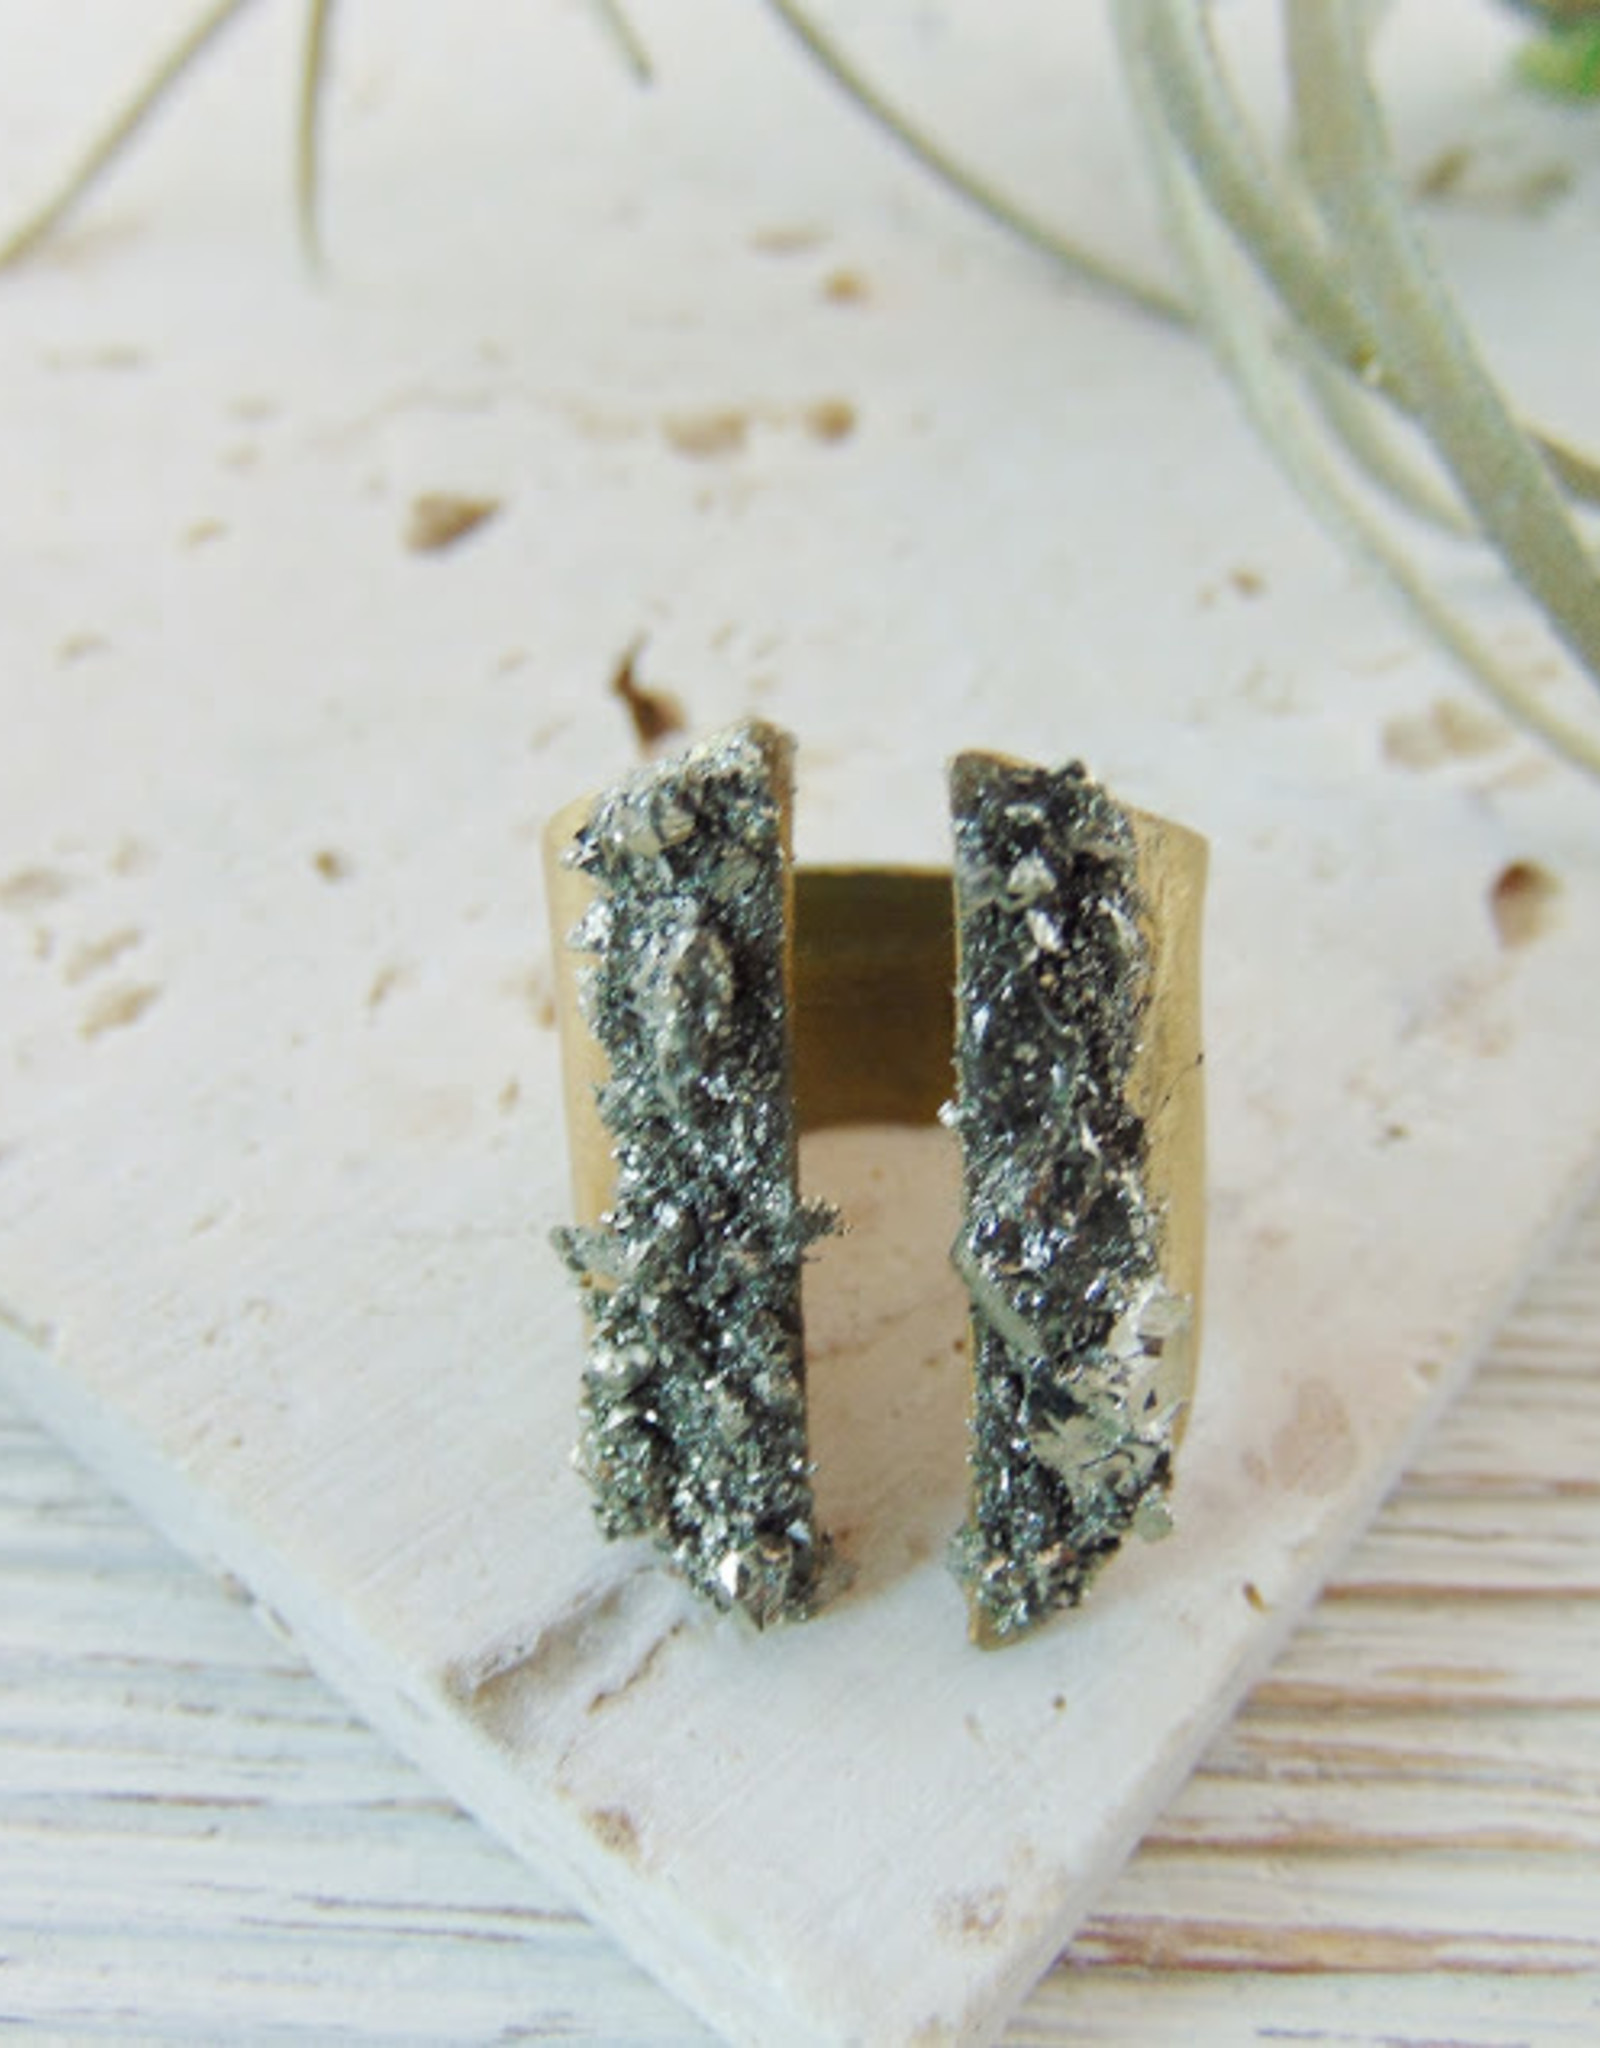 Dynamo Pyrite Mineral Ring